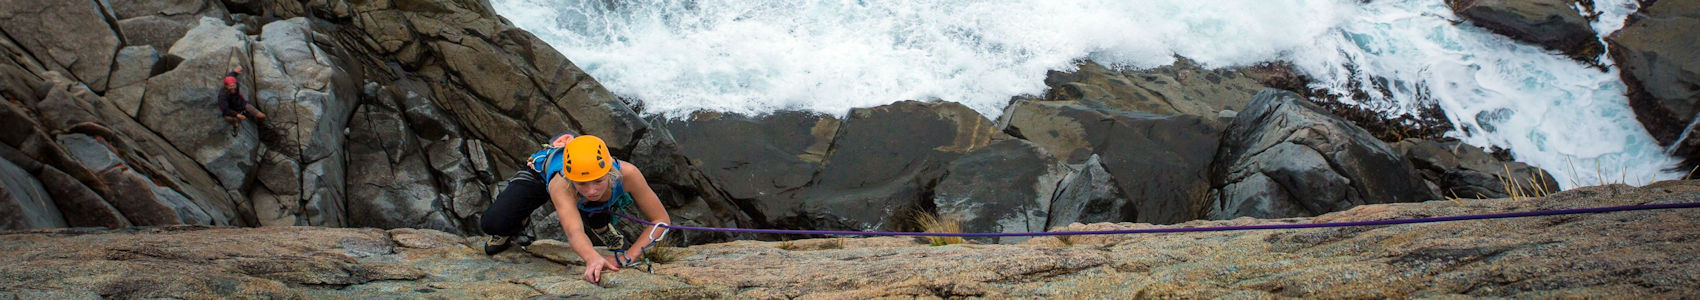 rock_climbing1_1